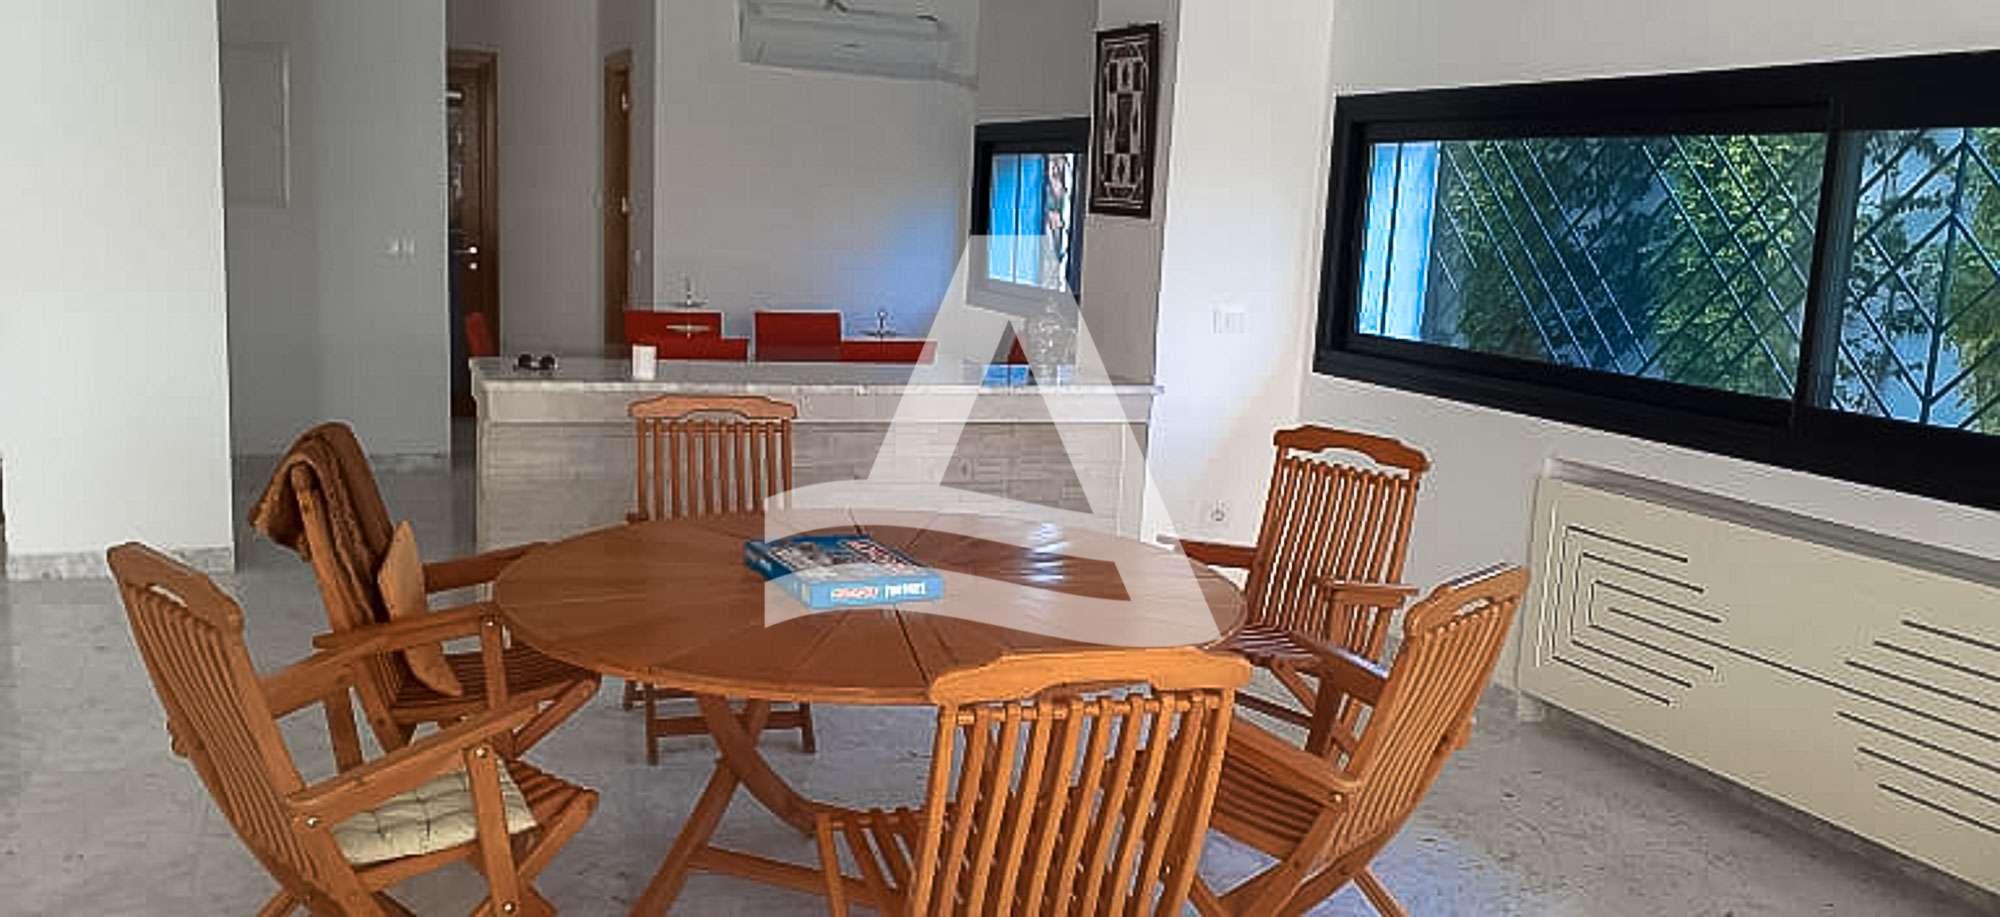 httpss3.amazonaws.comlogimoaws_Arcane_immobilière_la_Marsa-_location_-_vente_la_marsa_8_sur_21_1574354370811-1